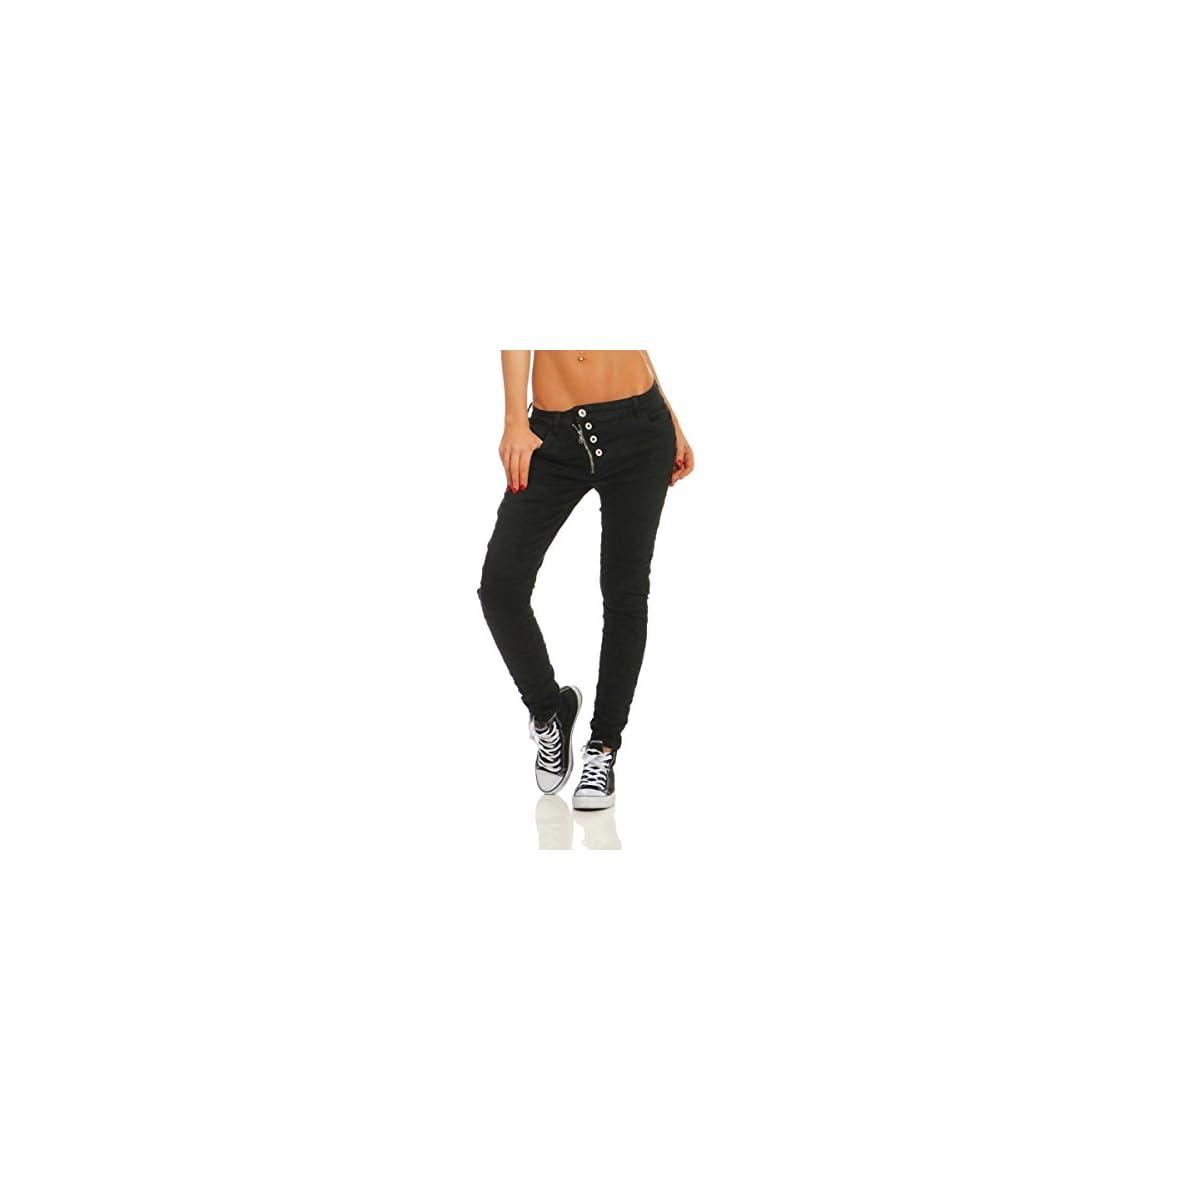 Fashion4Young 11105 Damen Jeans Hose Boyfriend Baggy Haremsjeans